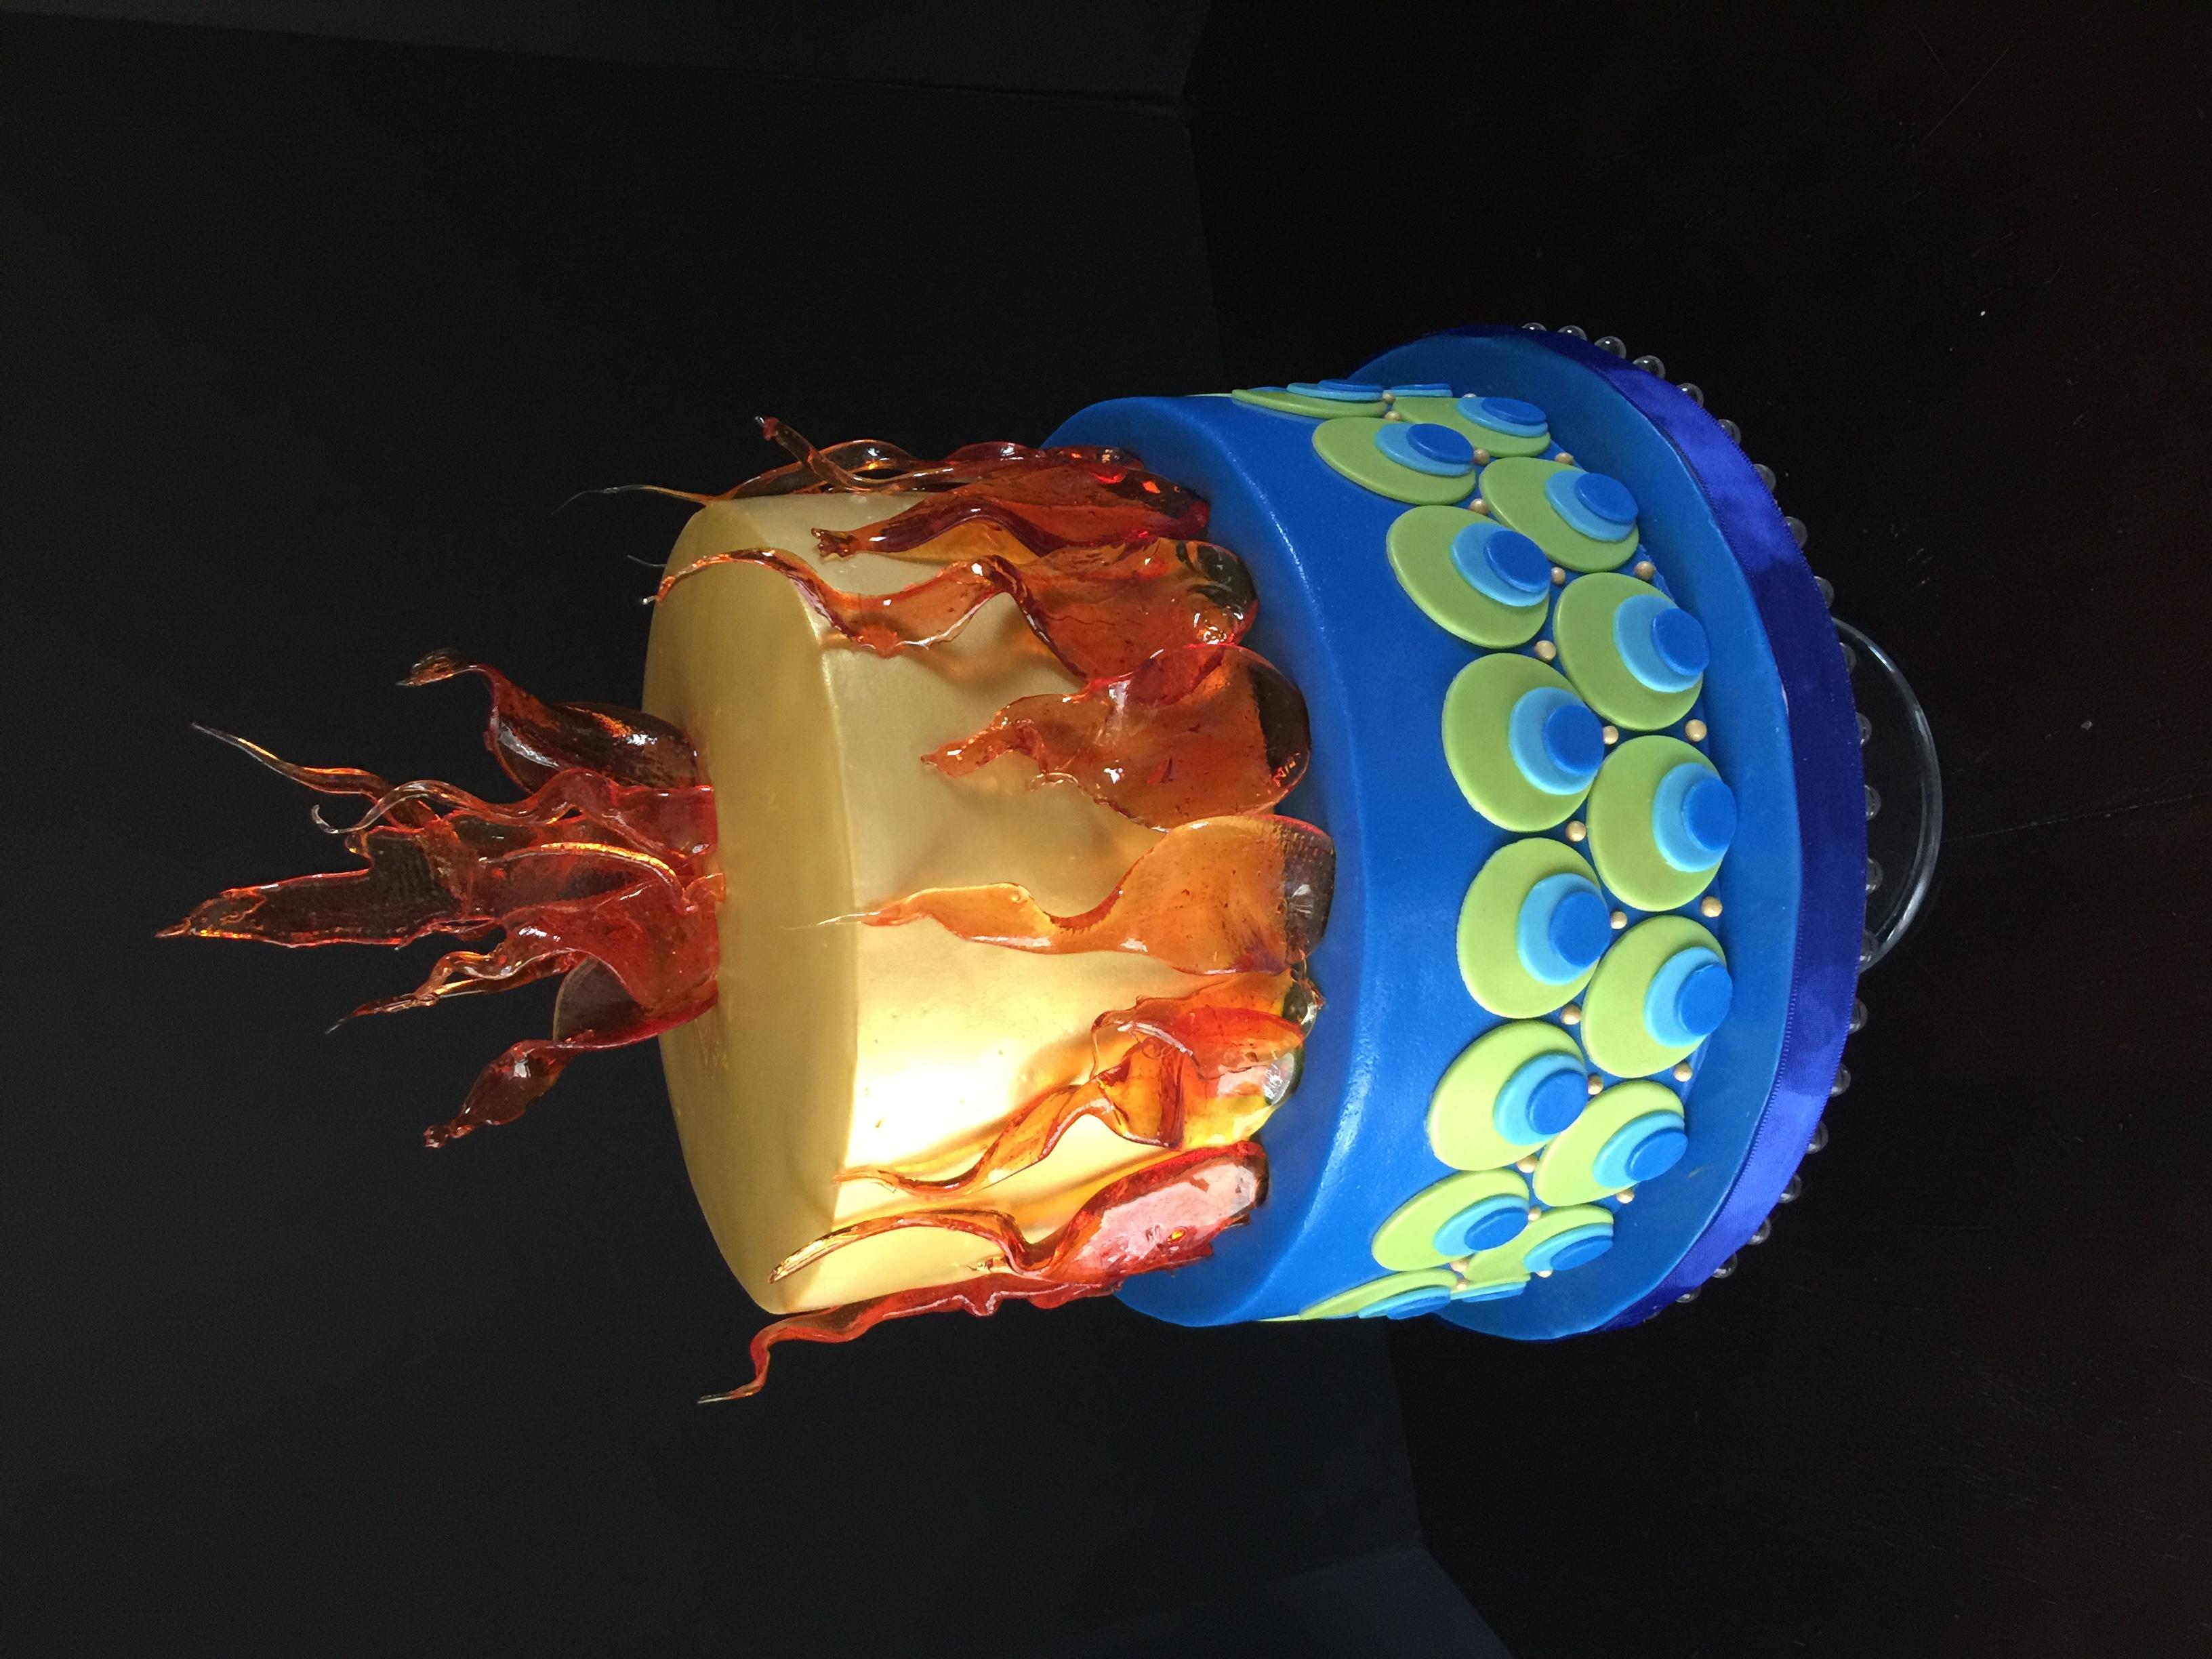 Fire & Peacock Cake